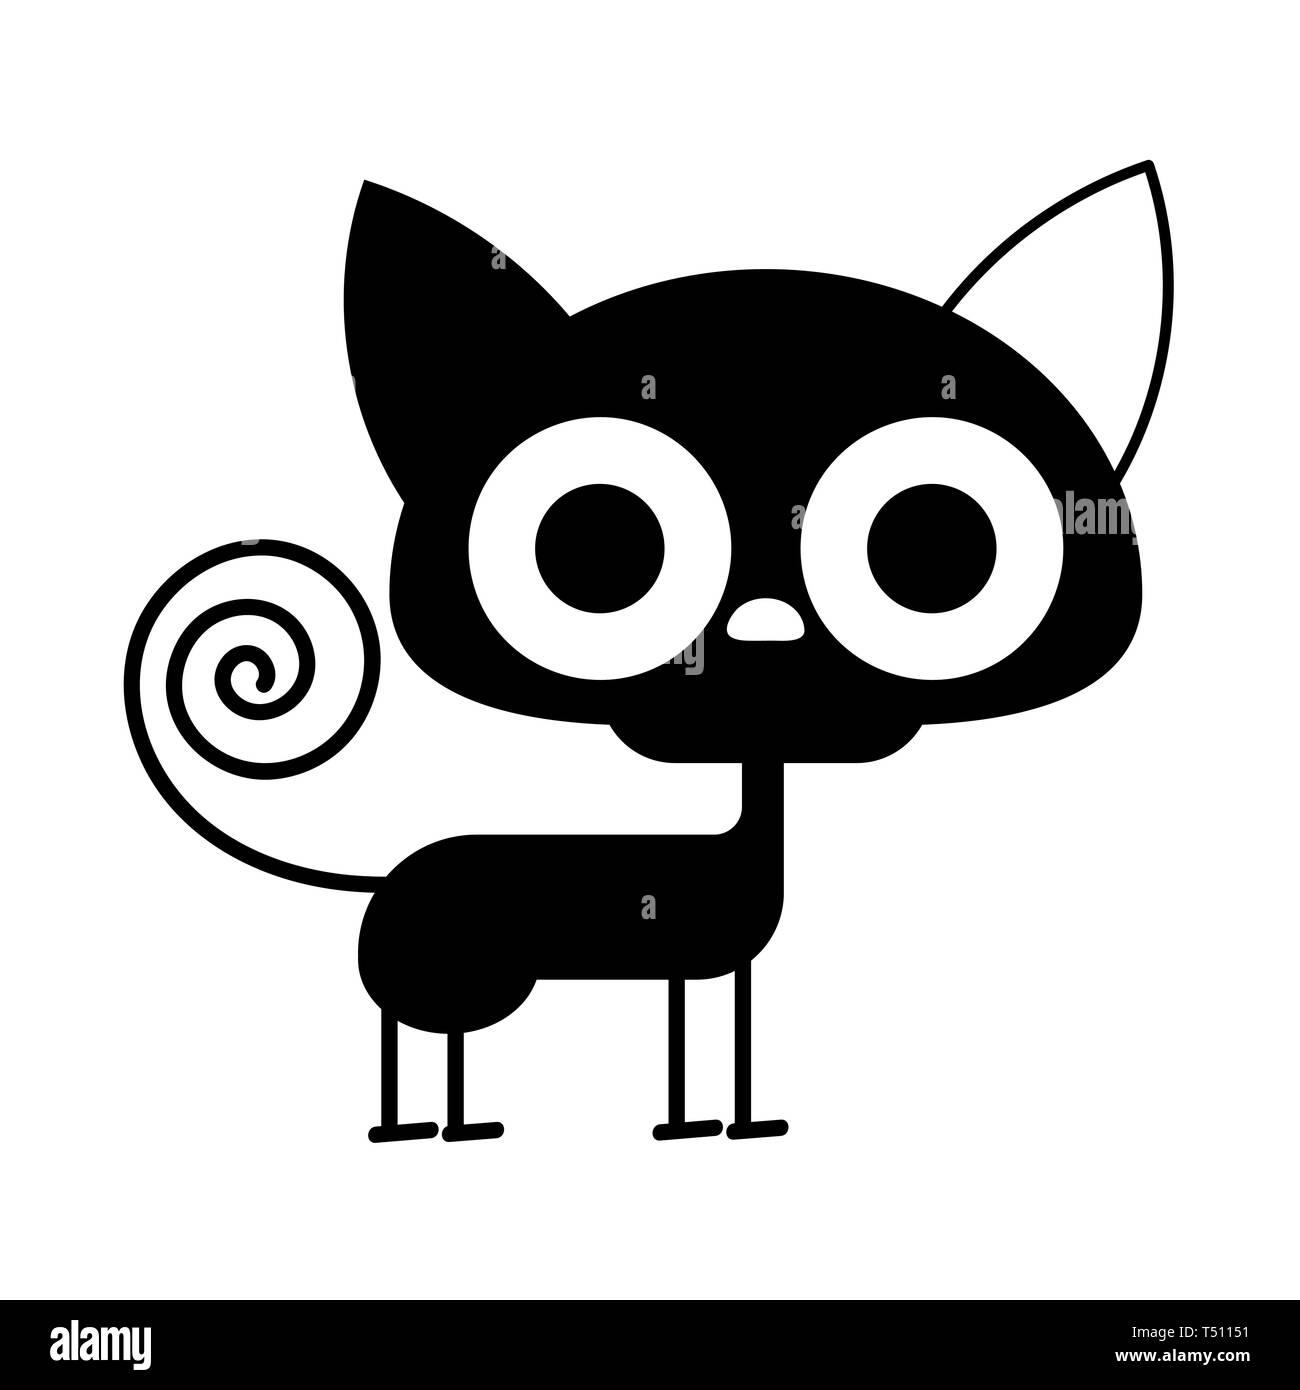 Cartoon Black Cat Drawing Cute Cat Illustration Funny Halloween Stock Vector Image Art Alamy